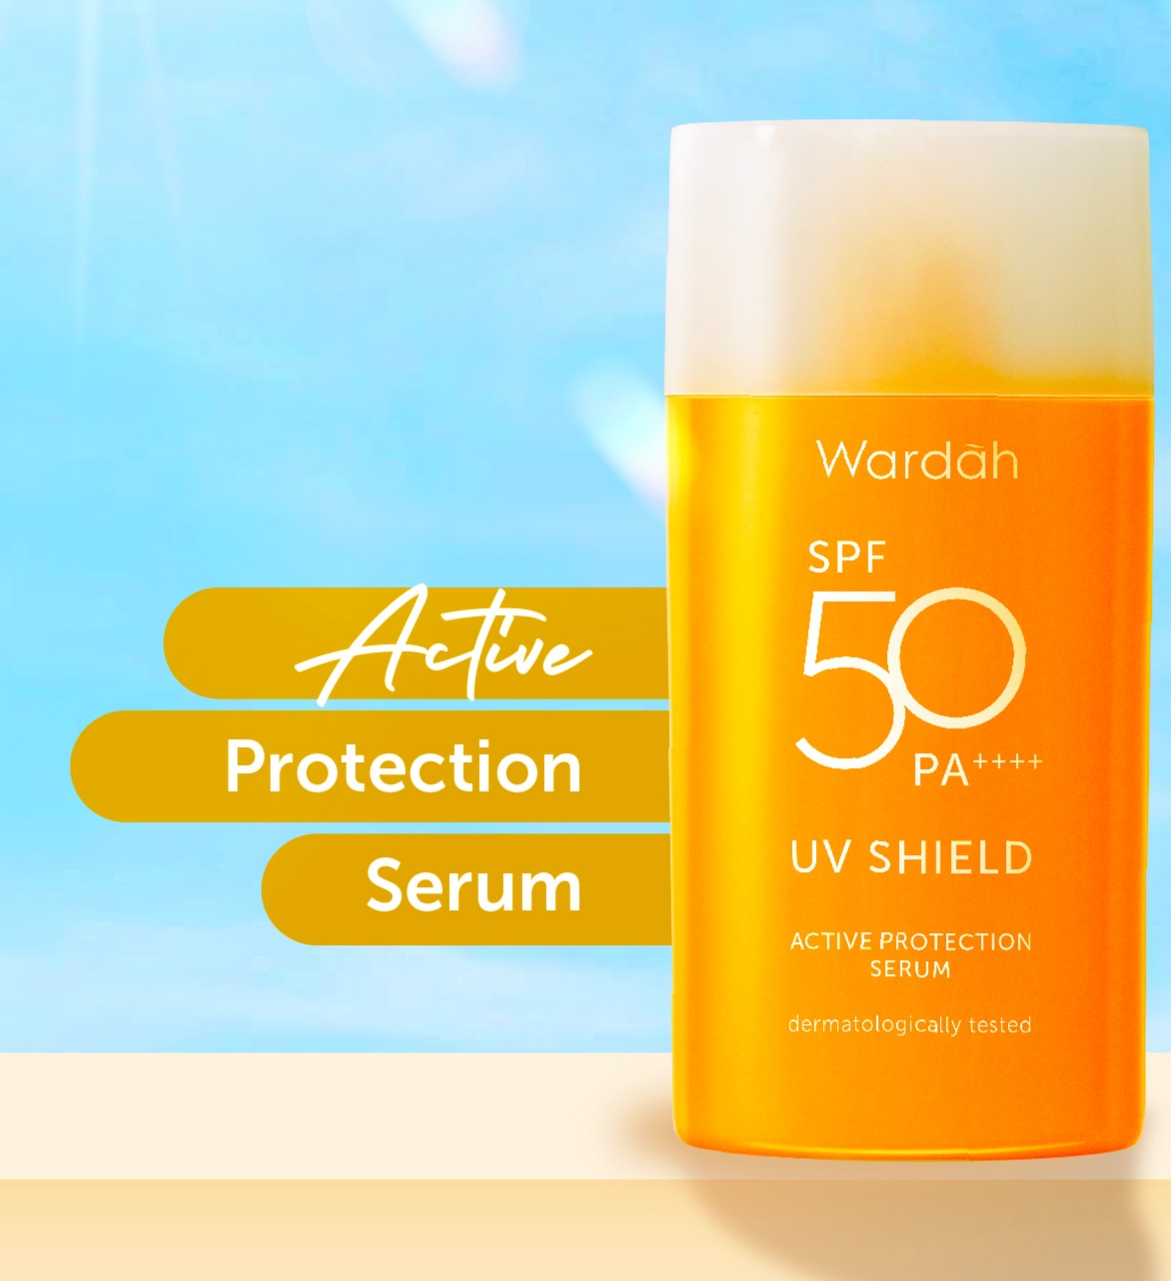 Wardah UV Shield Active Protection Serum SPF 50 PA++++